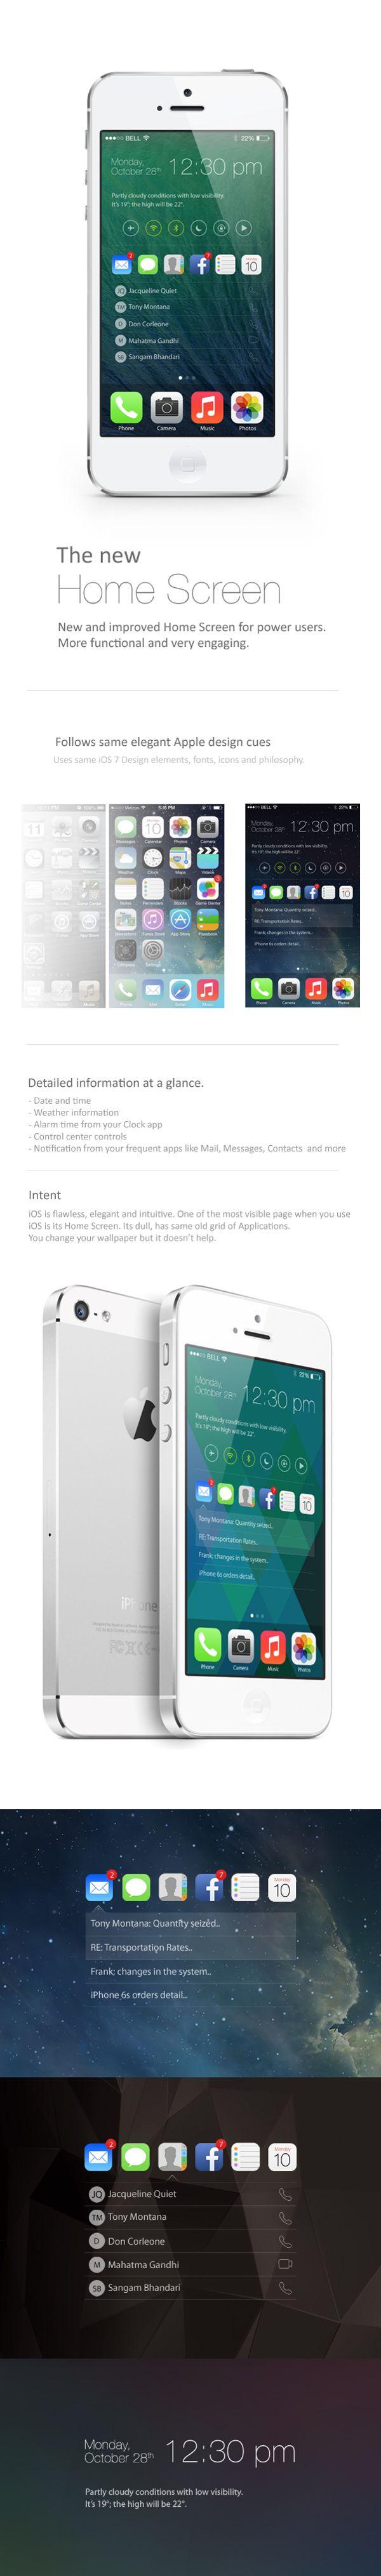 1605c4cf55db190b3a85c6b5ca4a4d54 mobile design app design